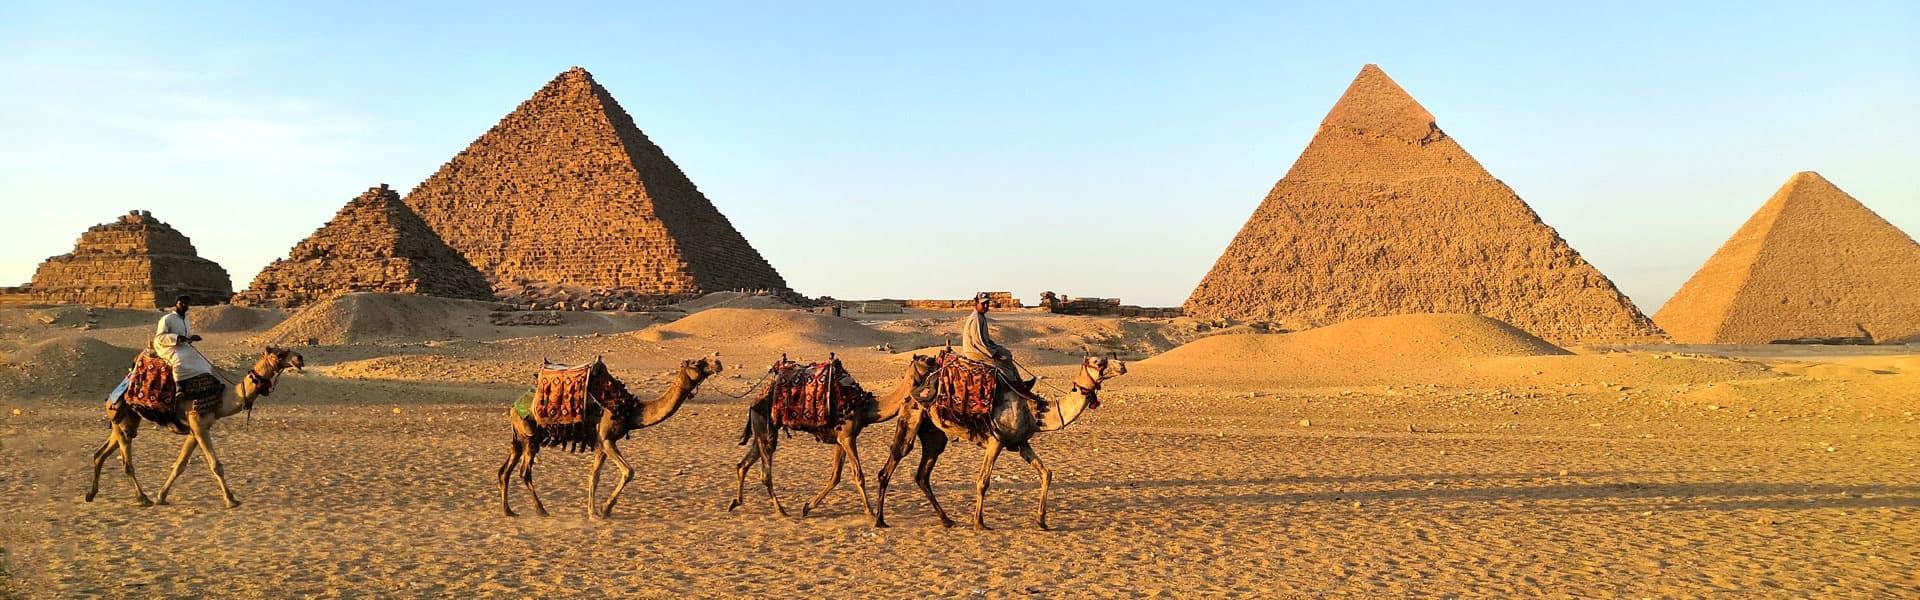 Giza Pyramids of Egypt